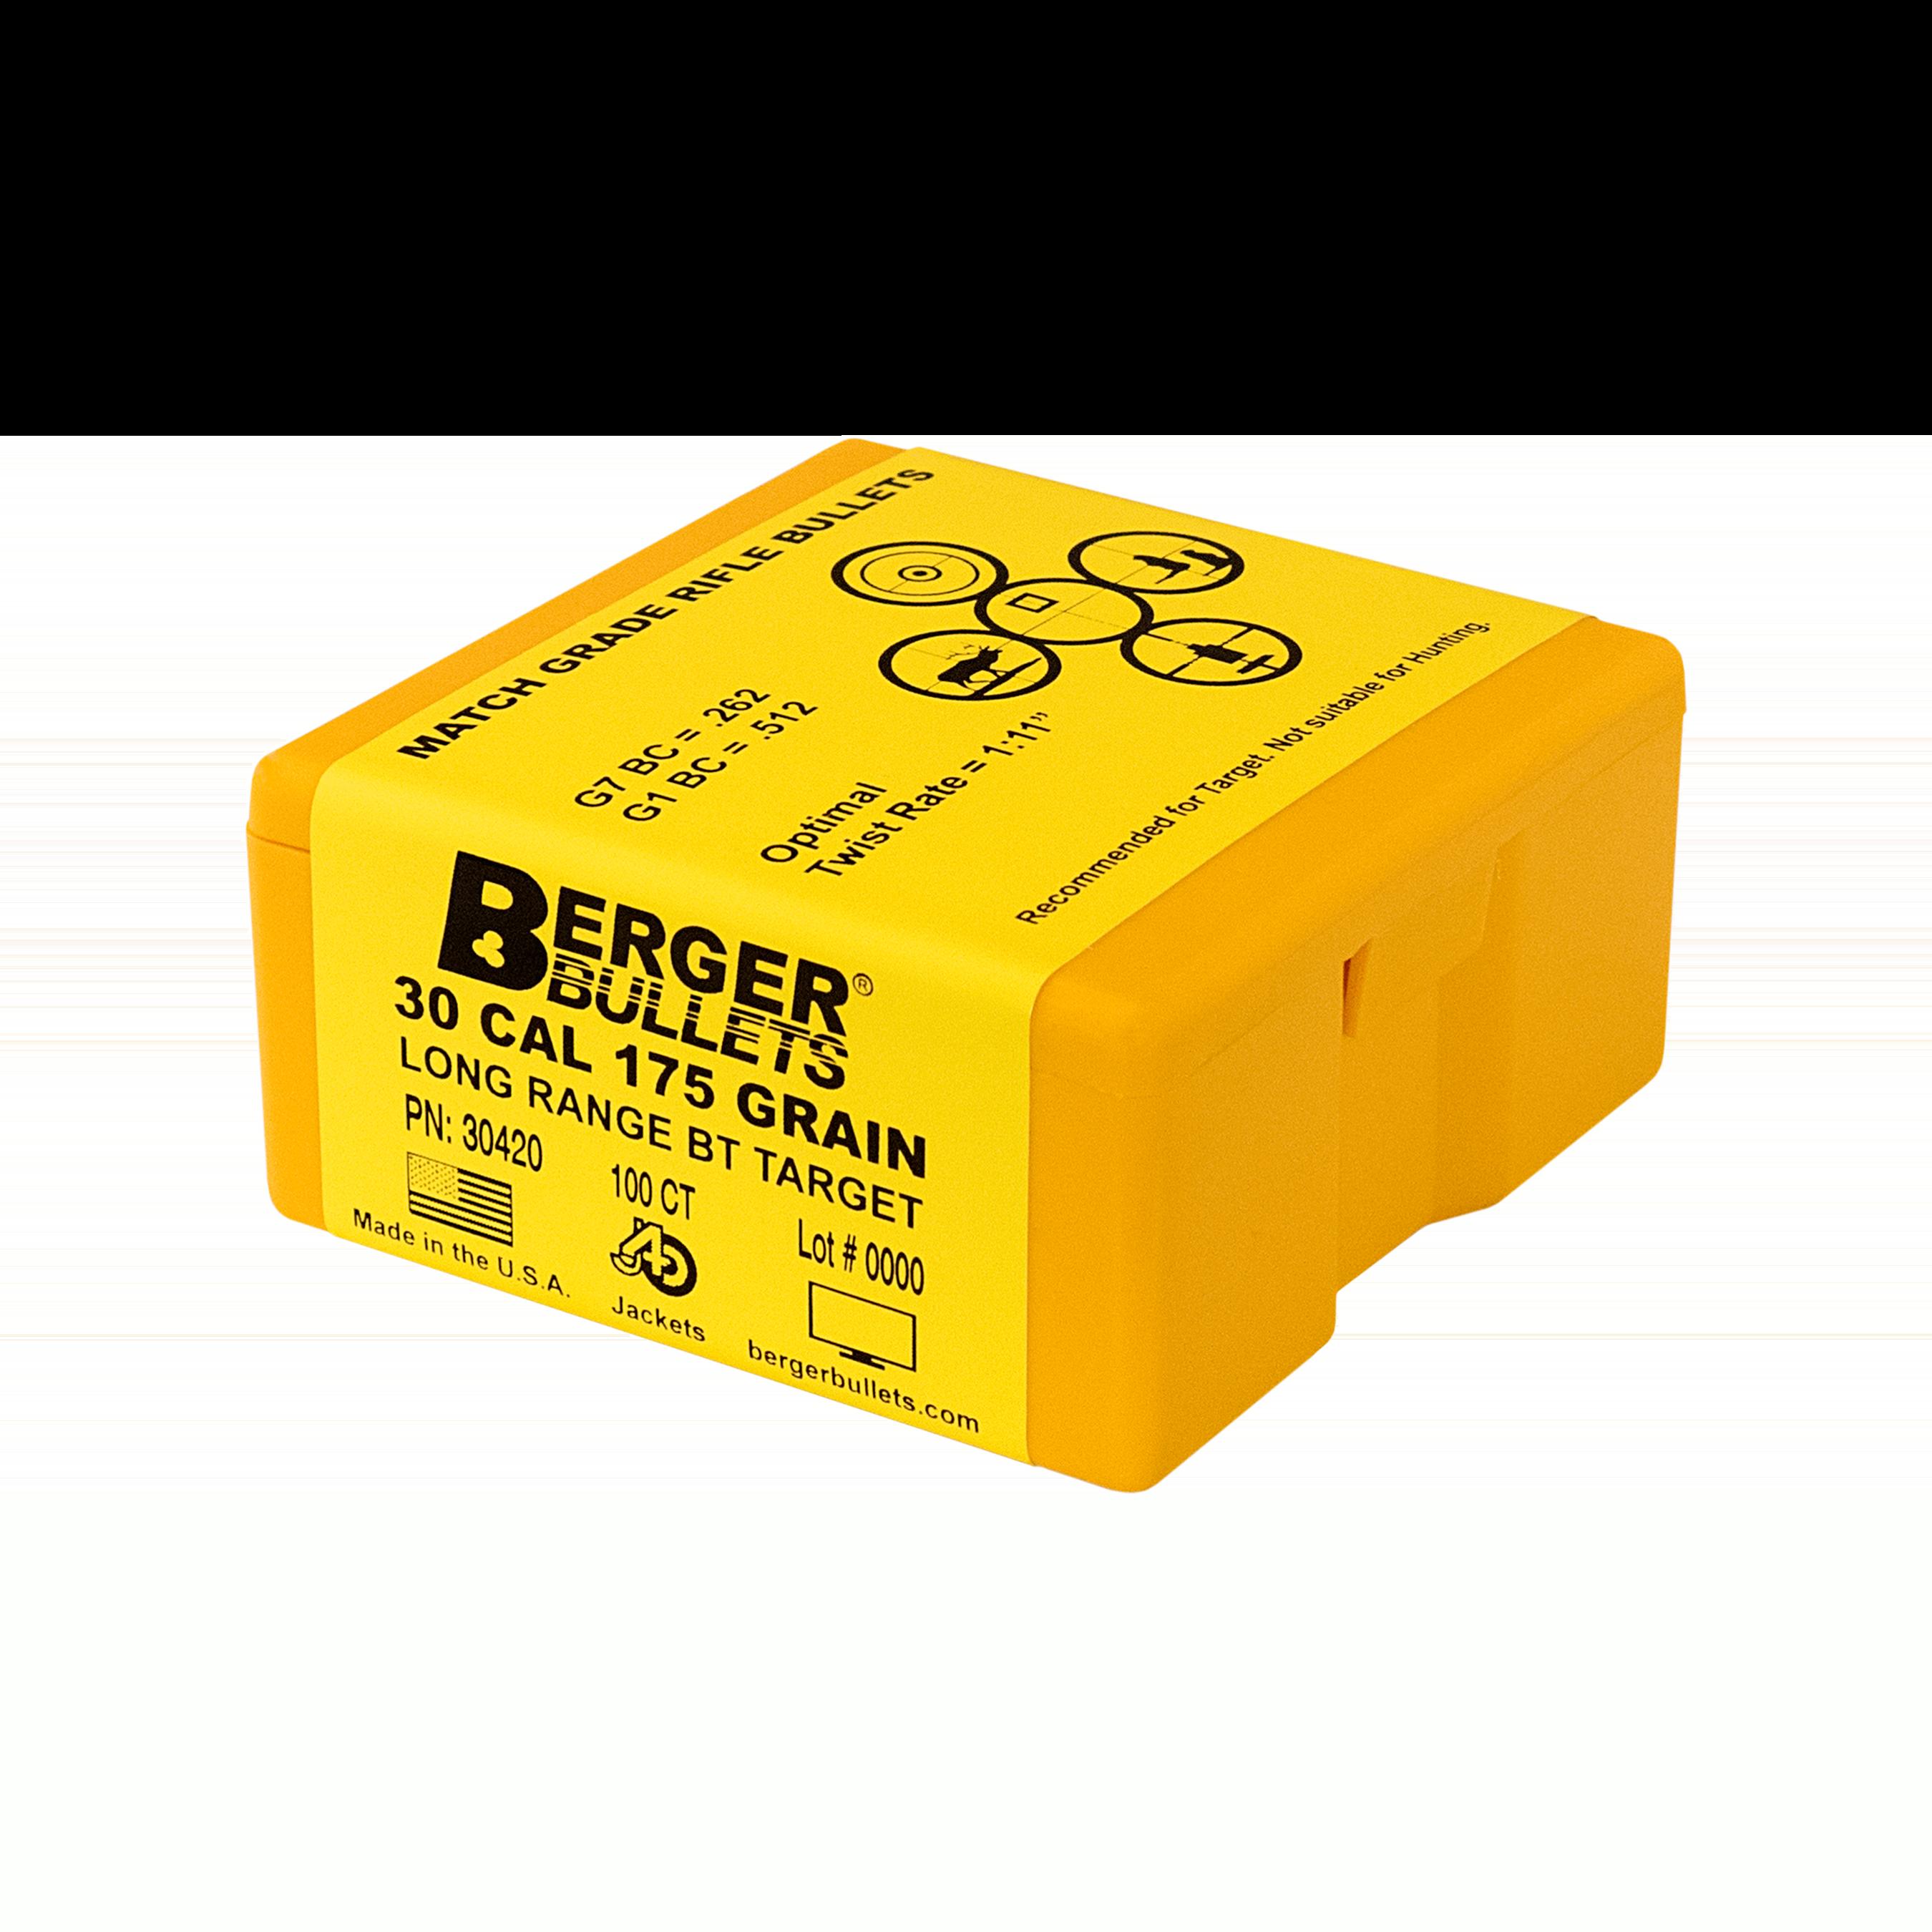 Berger 30 Cal 175 Gr Long Range BT Target Bullets (100 Ct)